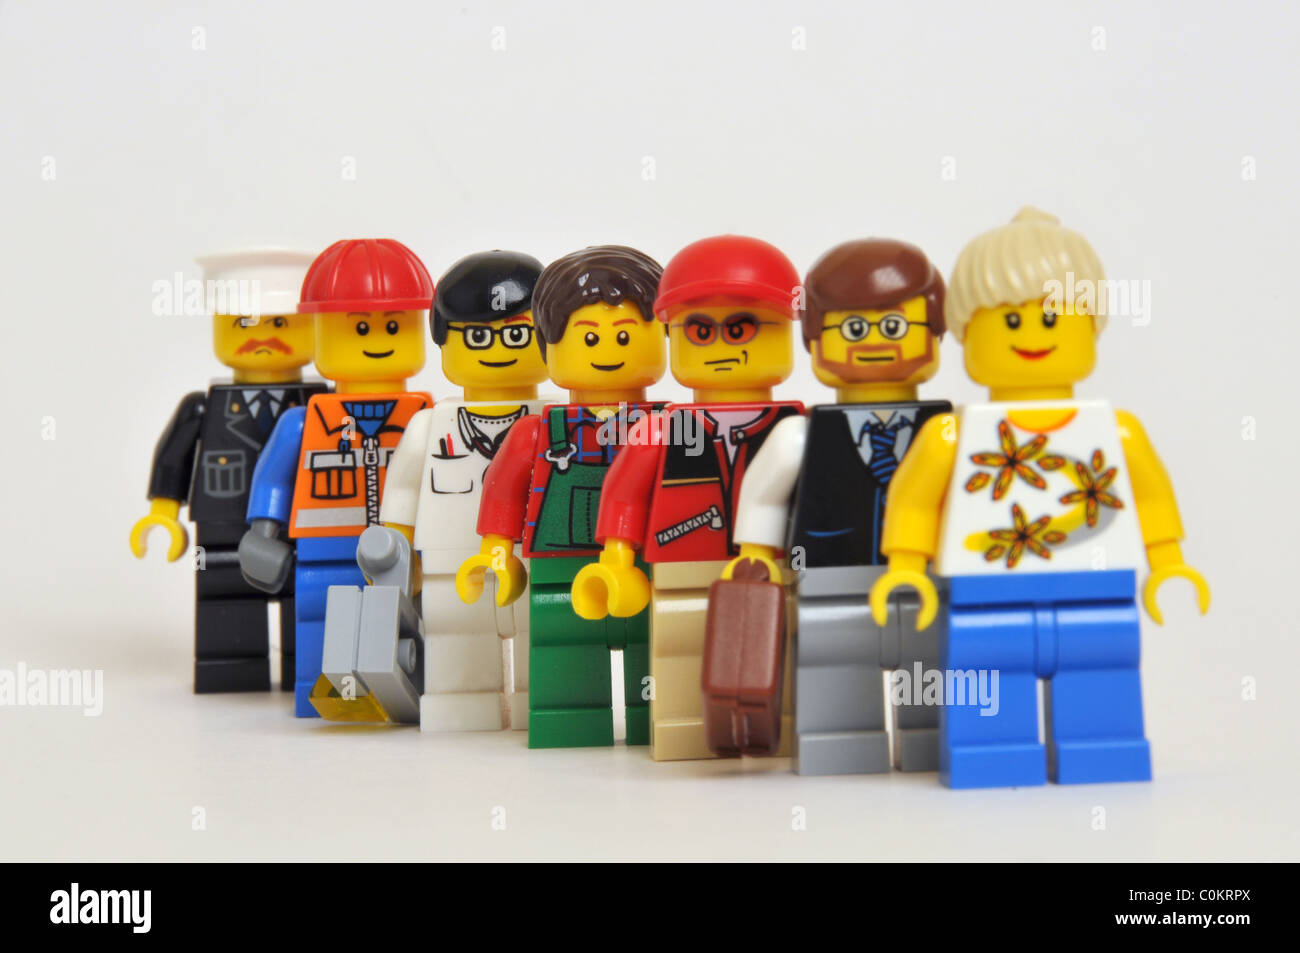 Menschen Personen Männer Frauen Berufe Handel Masse Stockbild